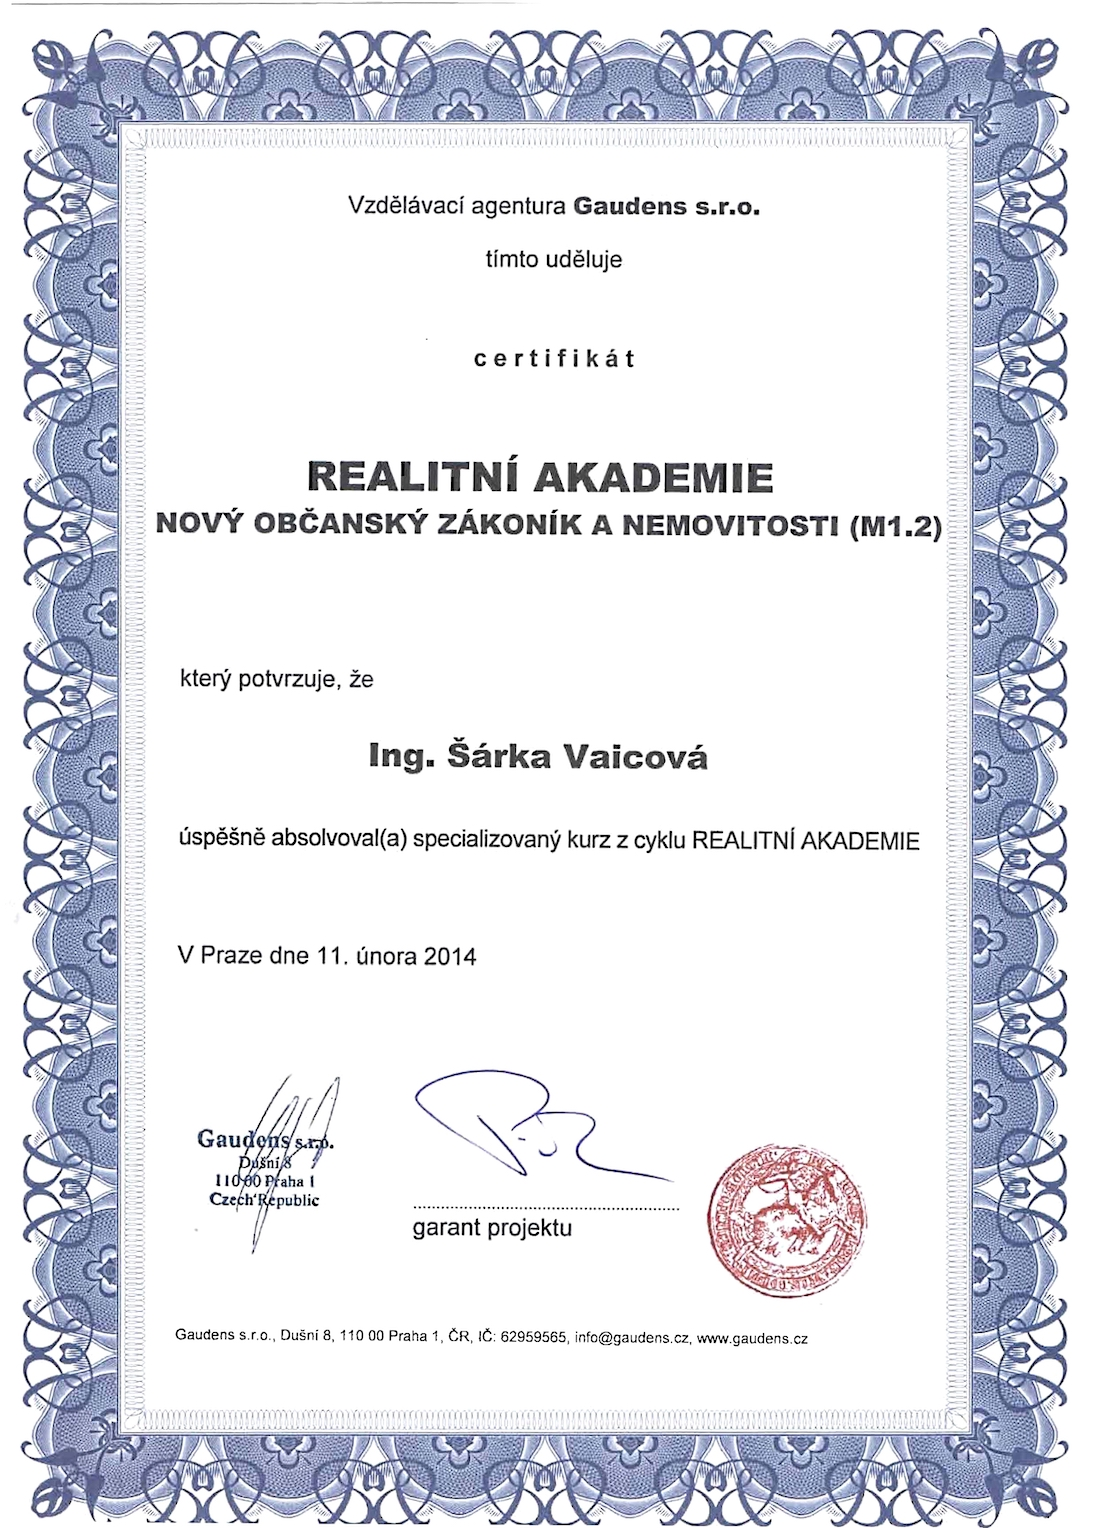 CertifikatIII.jpg